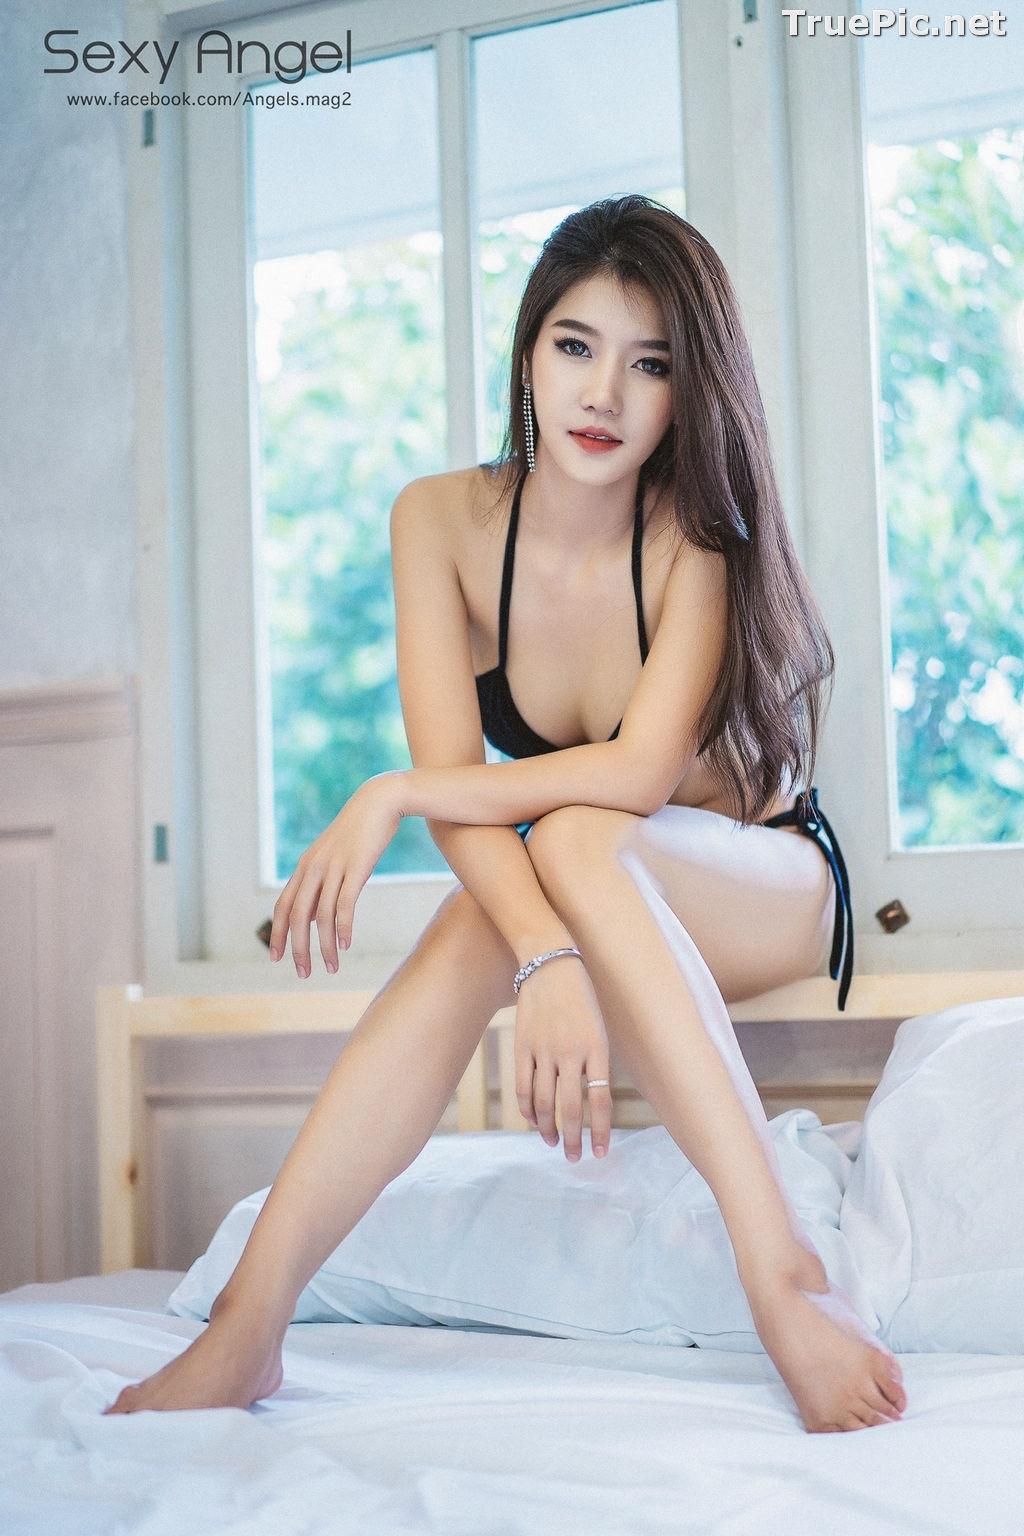 Image Thailand Model - Saruda Chalermsaen (EveAva) - Sexy Bikini Angel - TruePic.net - Picture-10